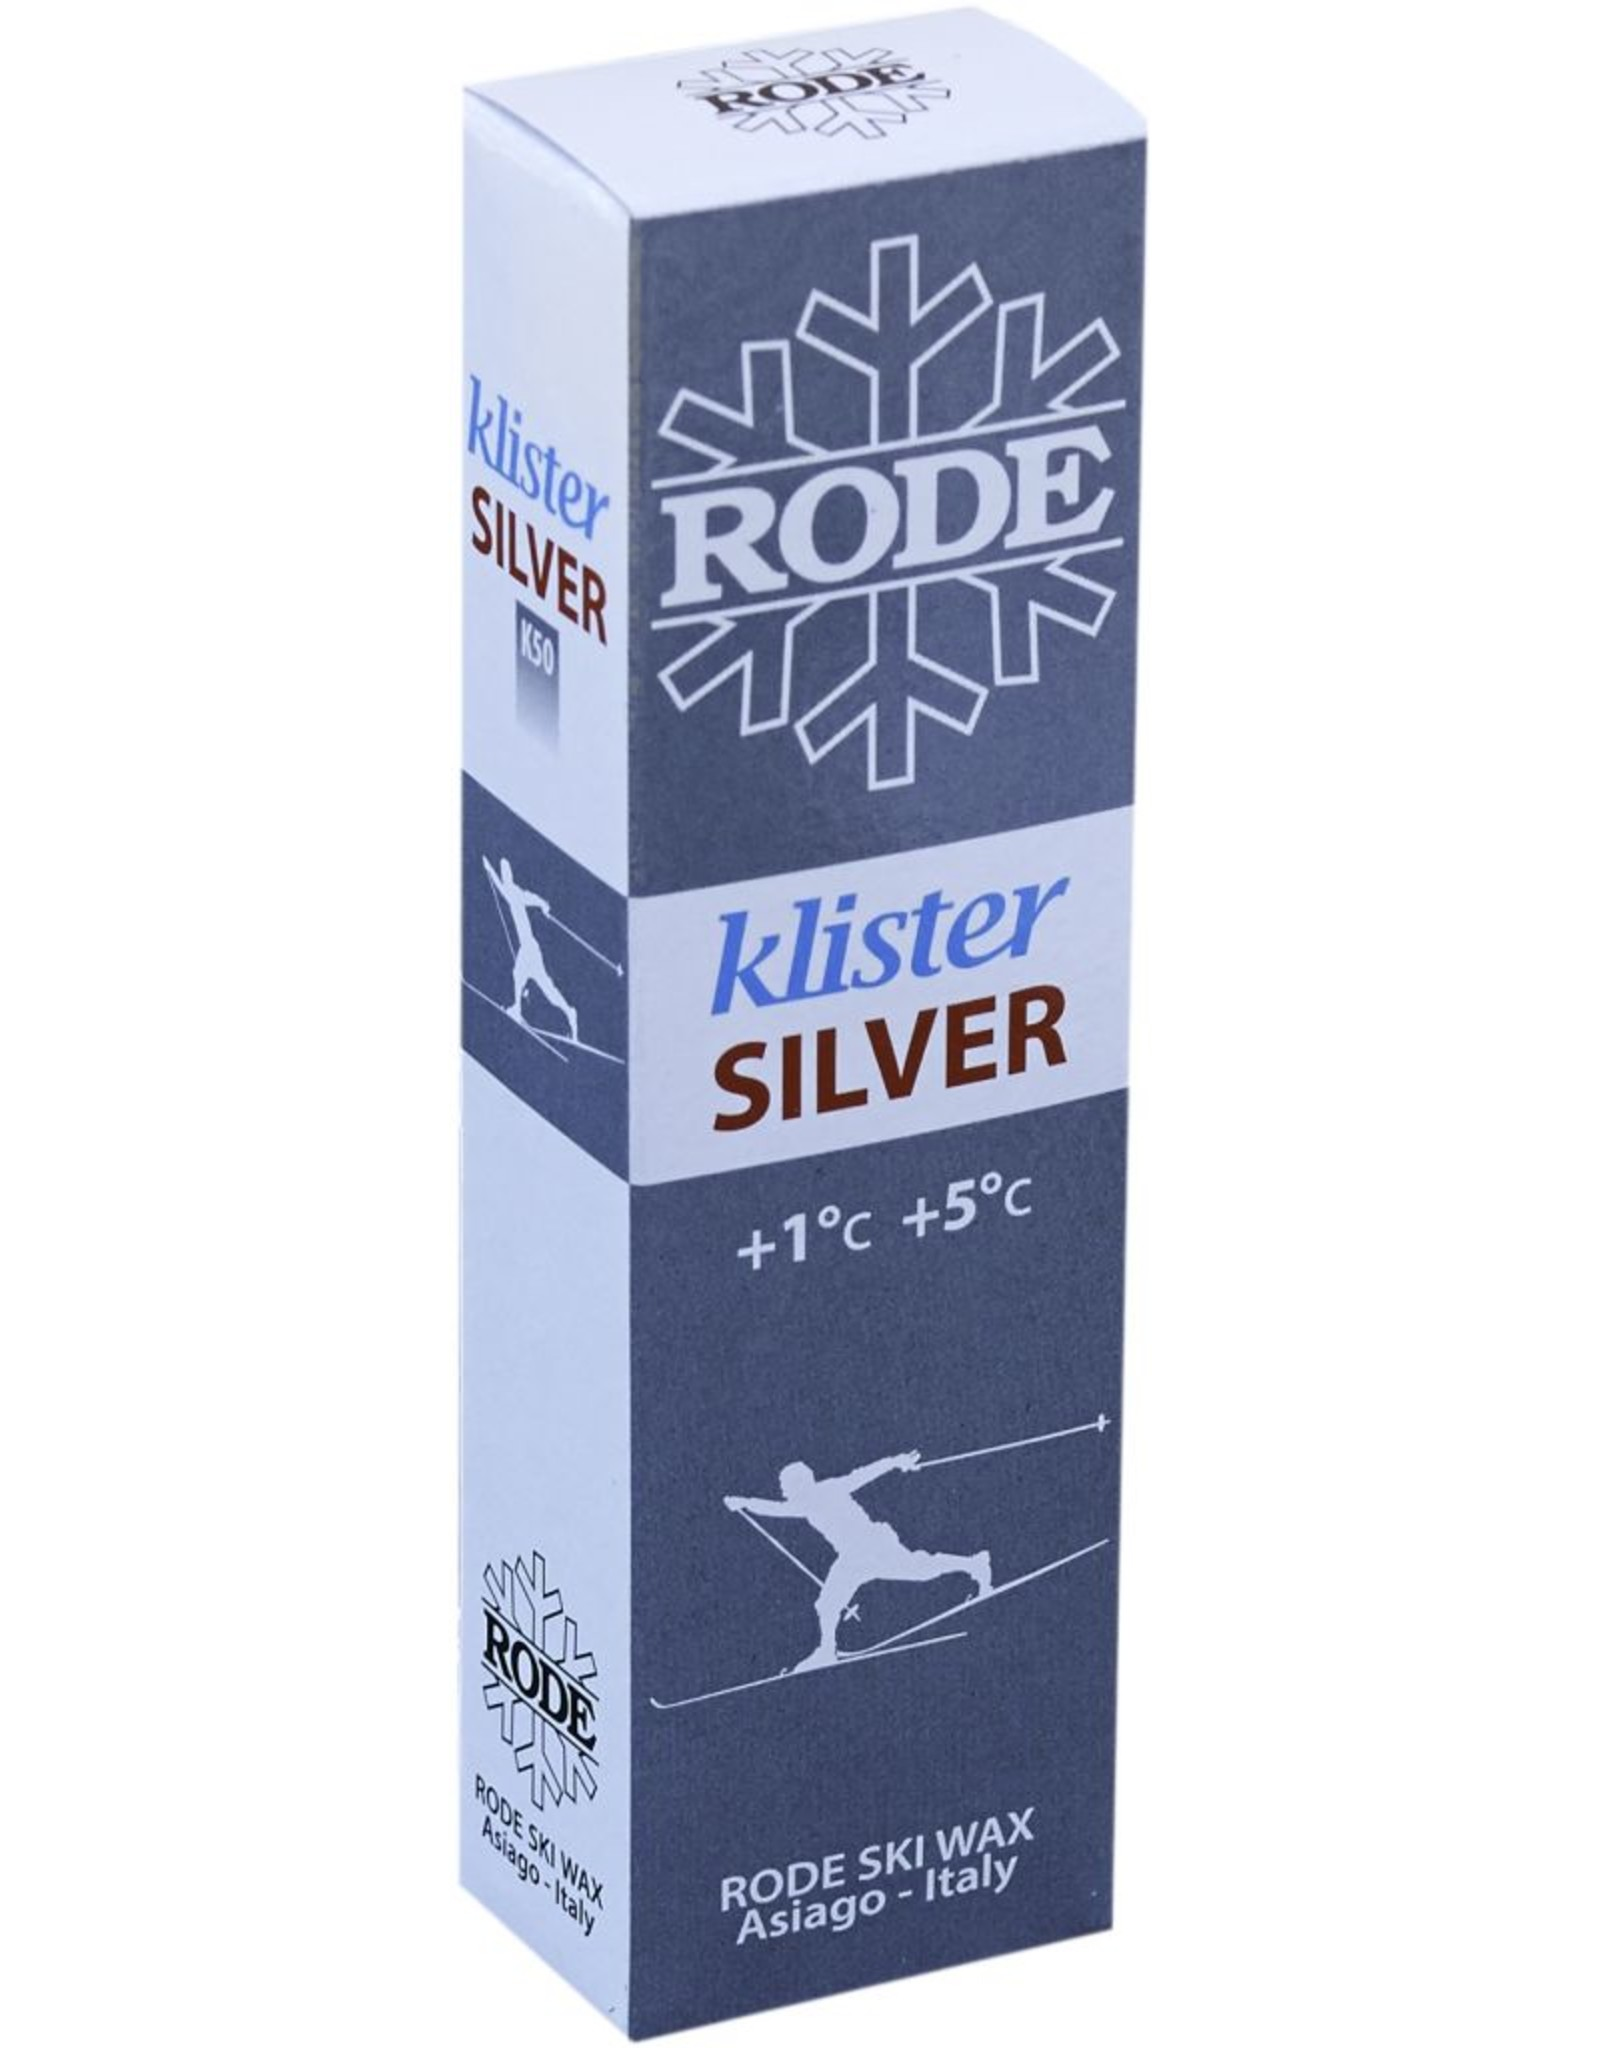 Rode Silver Klister 60g